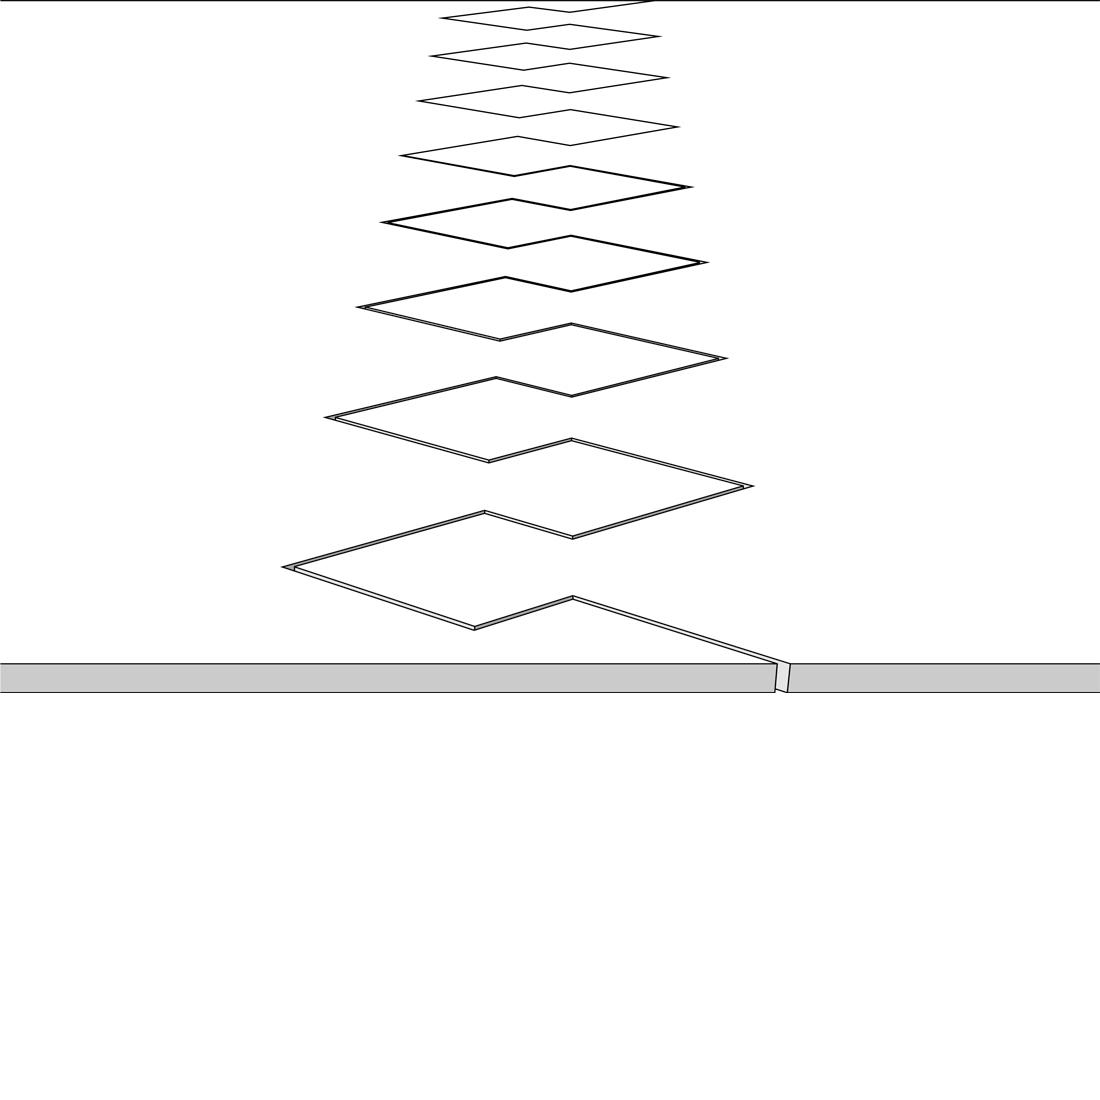 Puzzleverbindung